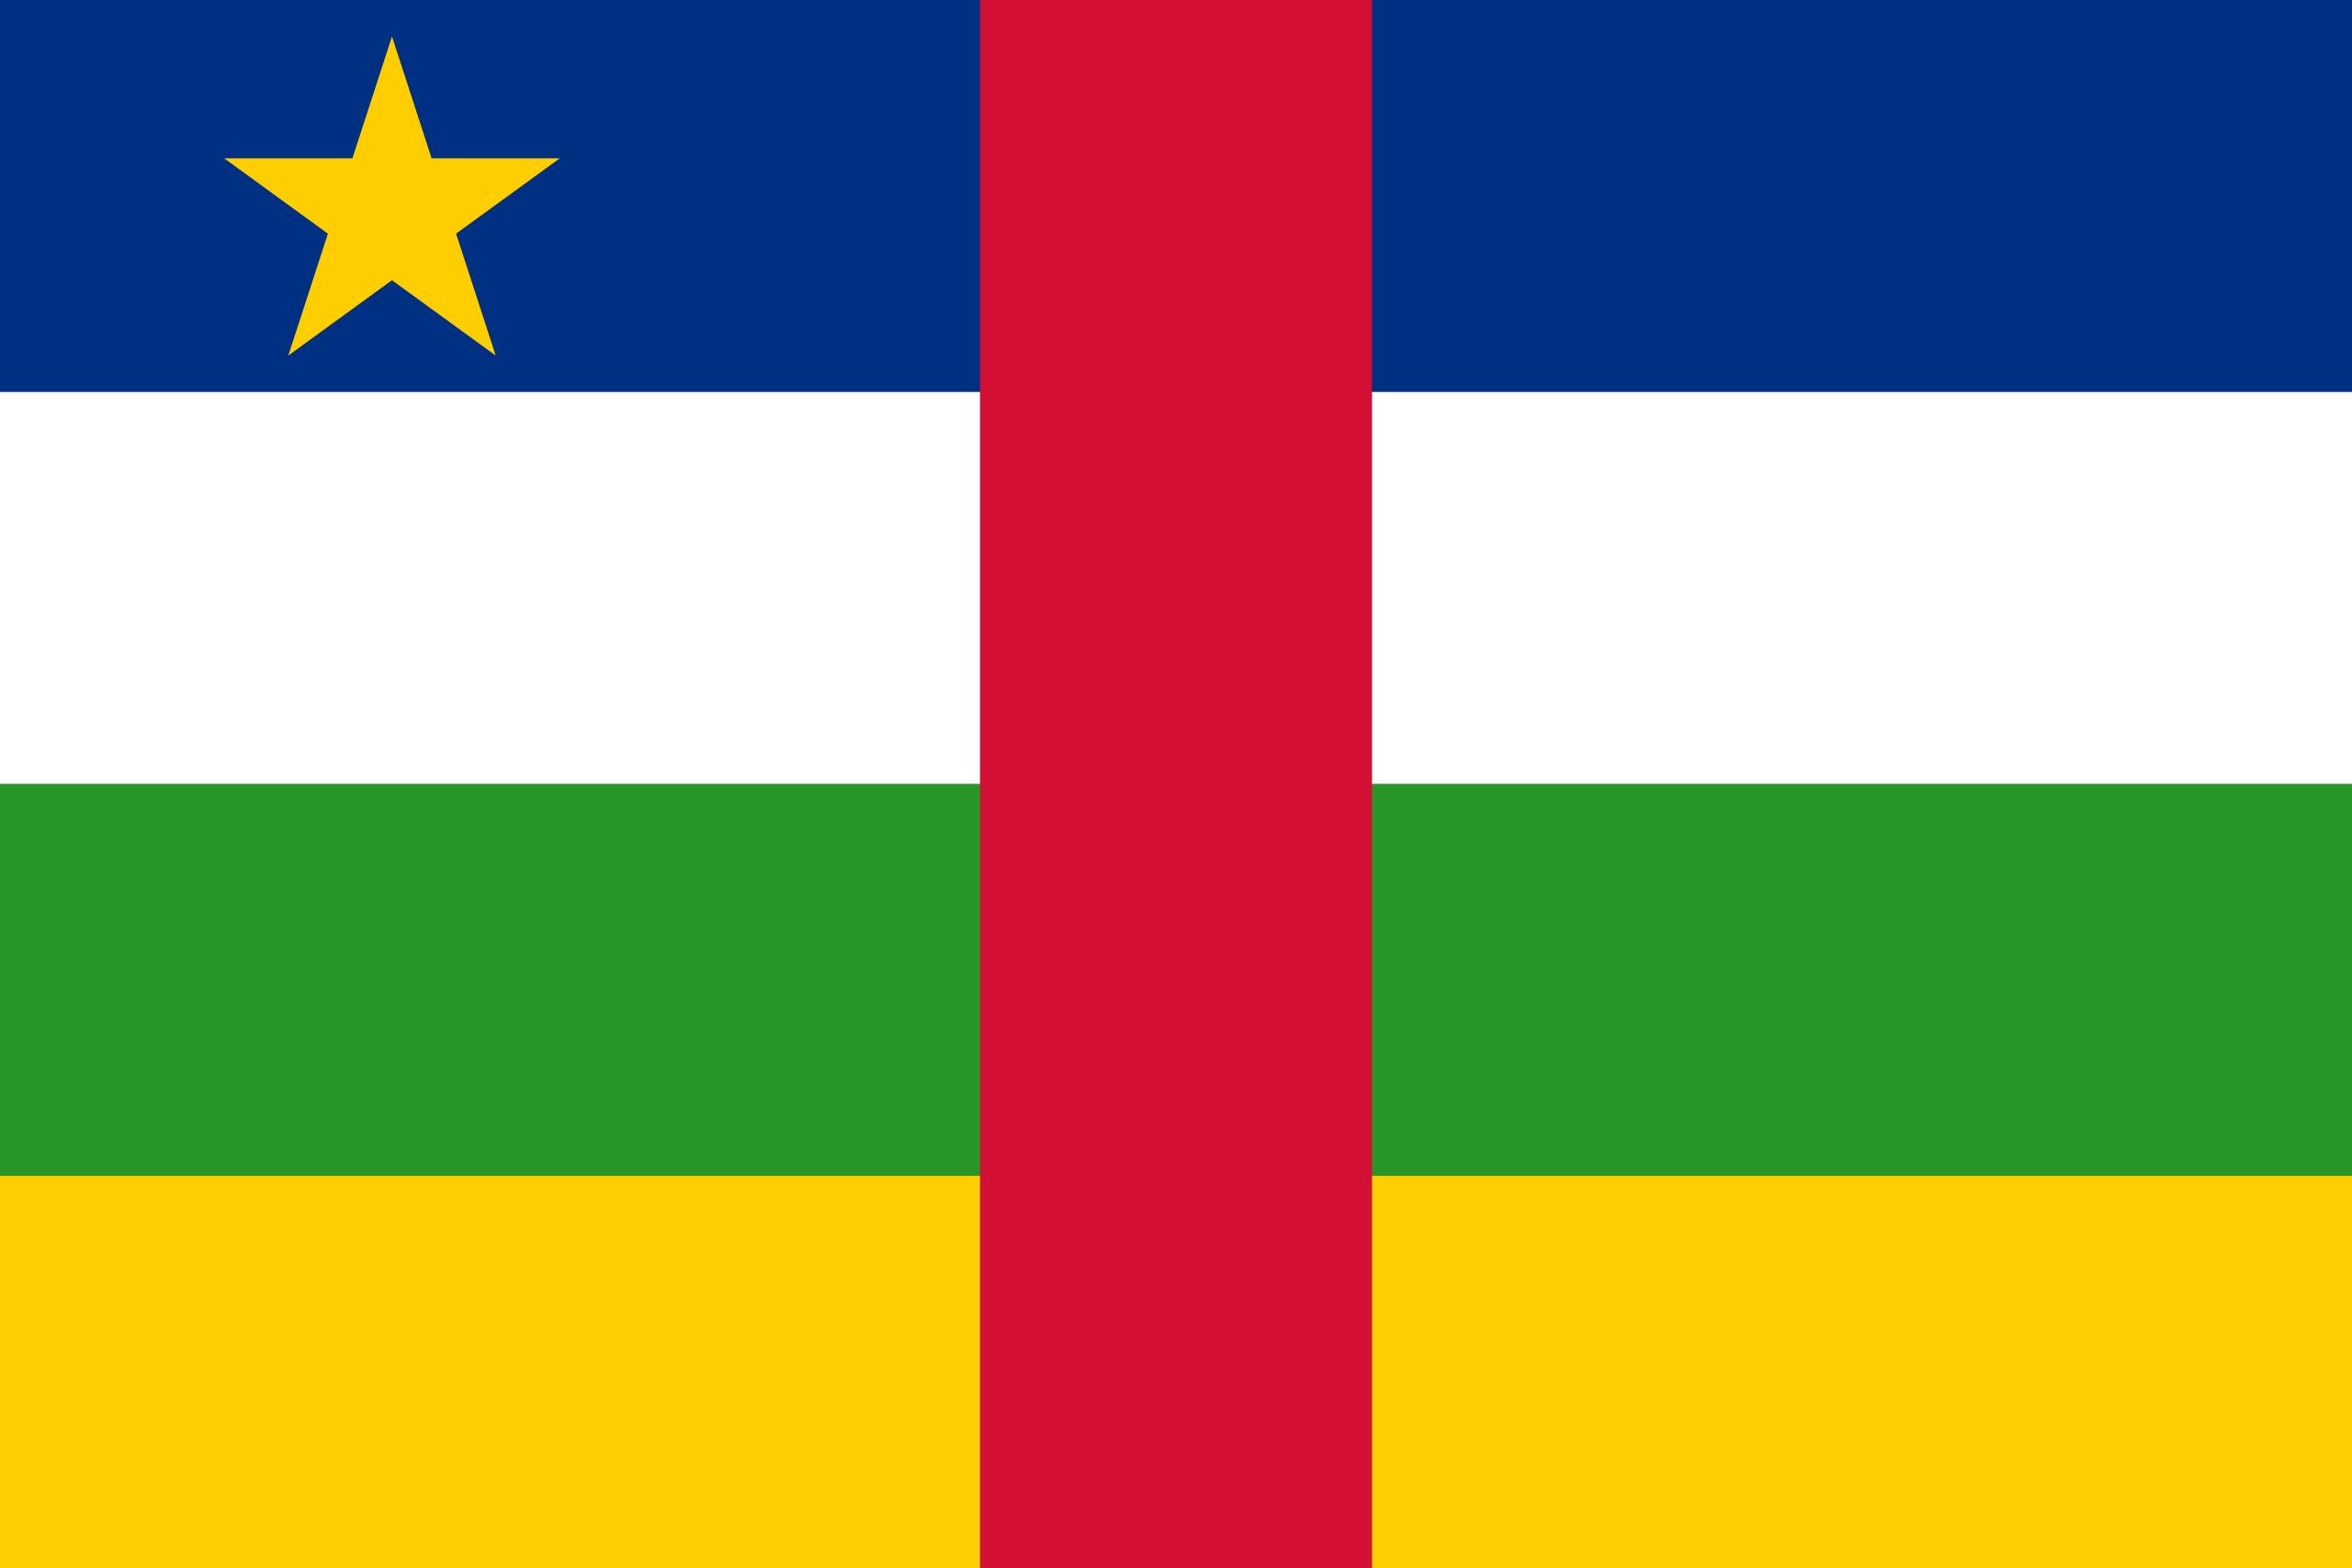 república centroafricana, देश, emblema, लोग�प्रतीकbolo - HD वॉलपेपर - प्रोफेसर-falken.com